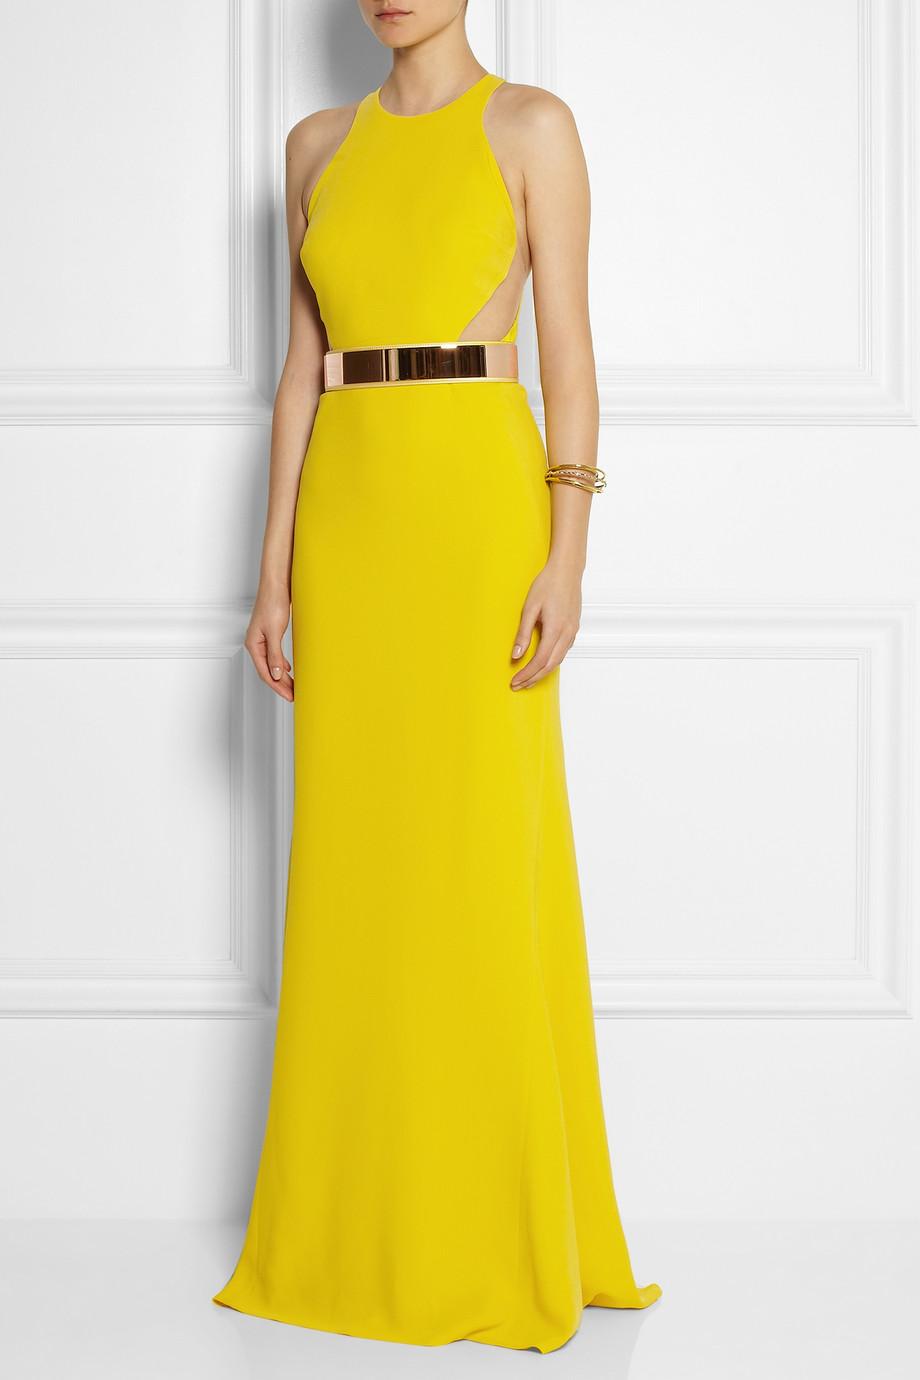 Stella McCartney Saskia Stretch-Cady Gown in Bright-Yellow